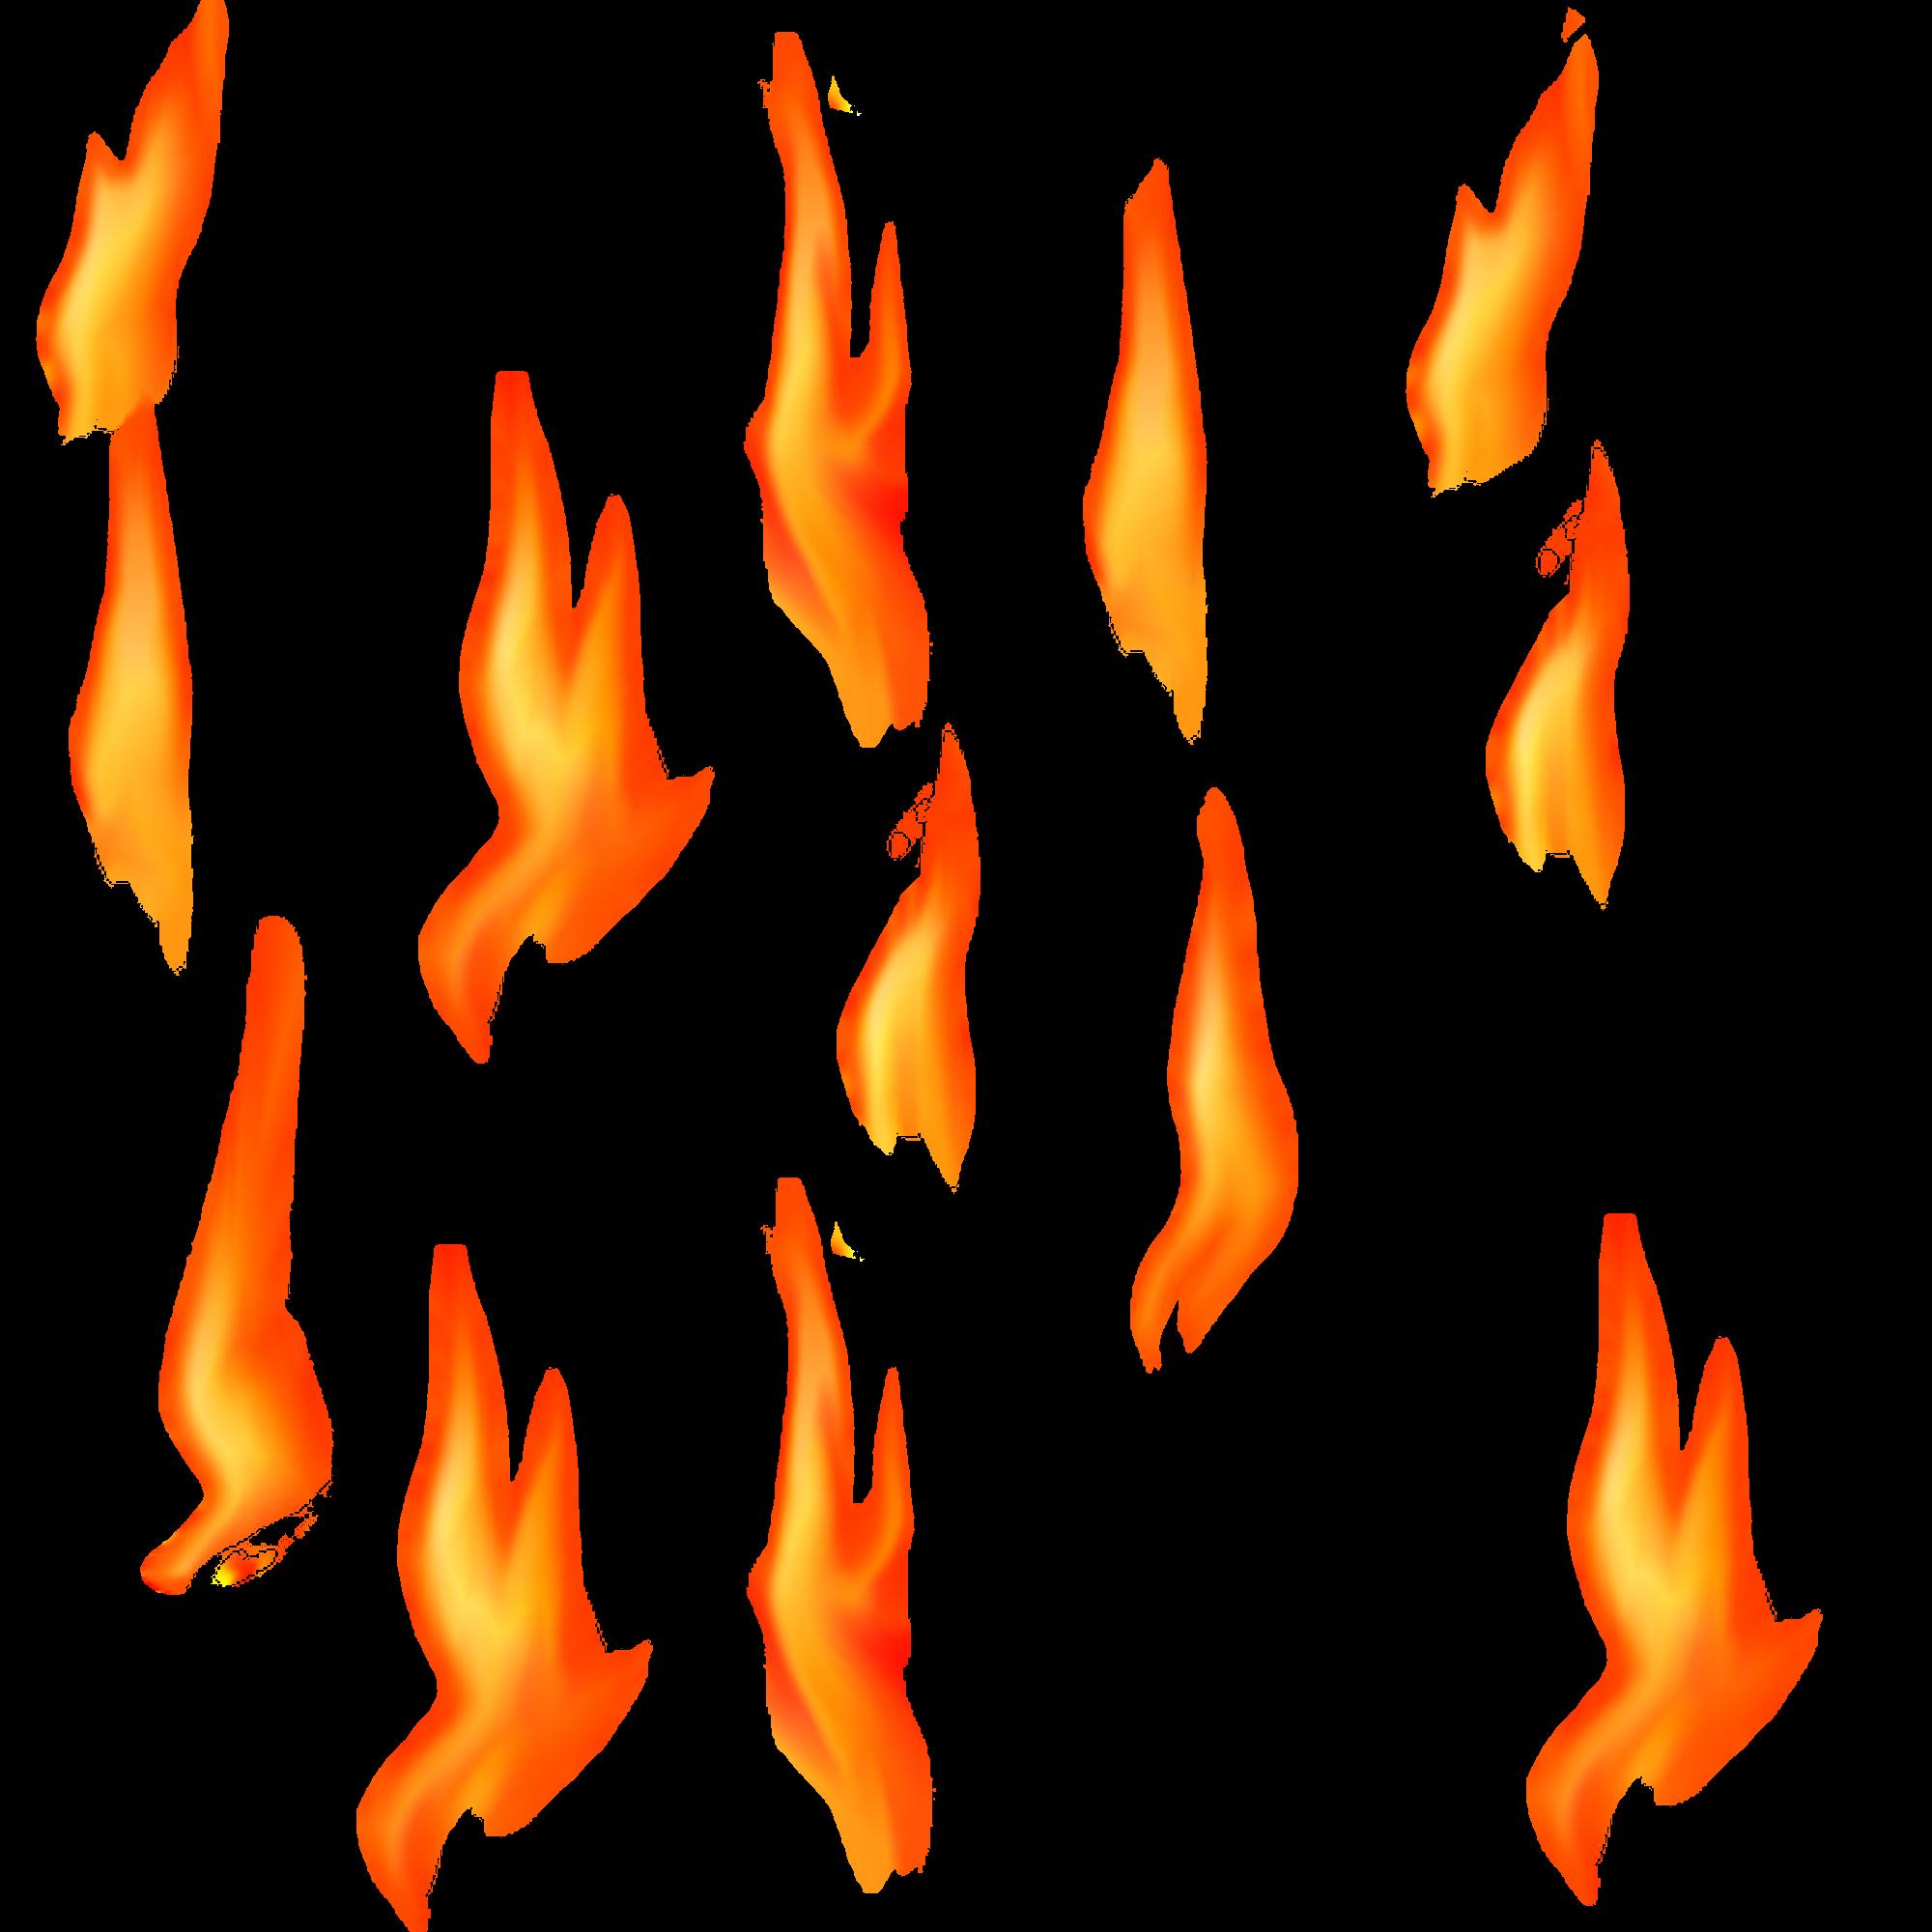 Fire Flame PNG Image   Fire Flame PNG Image image #699